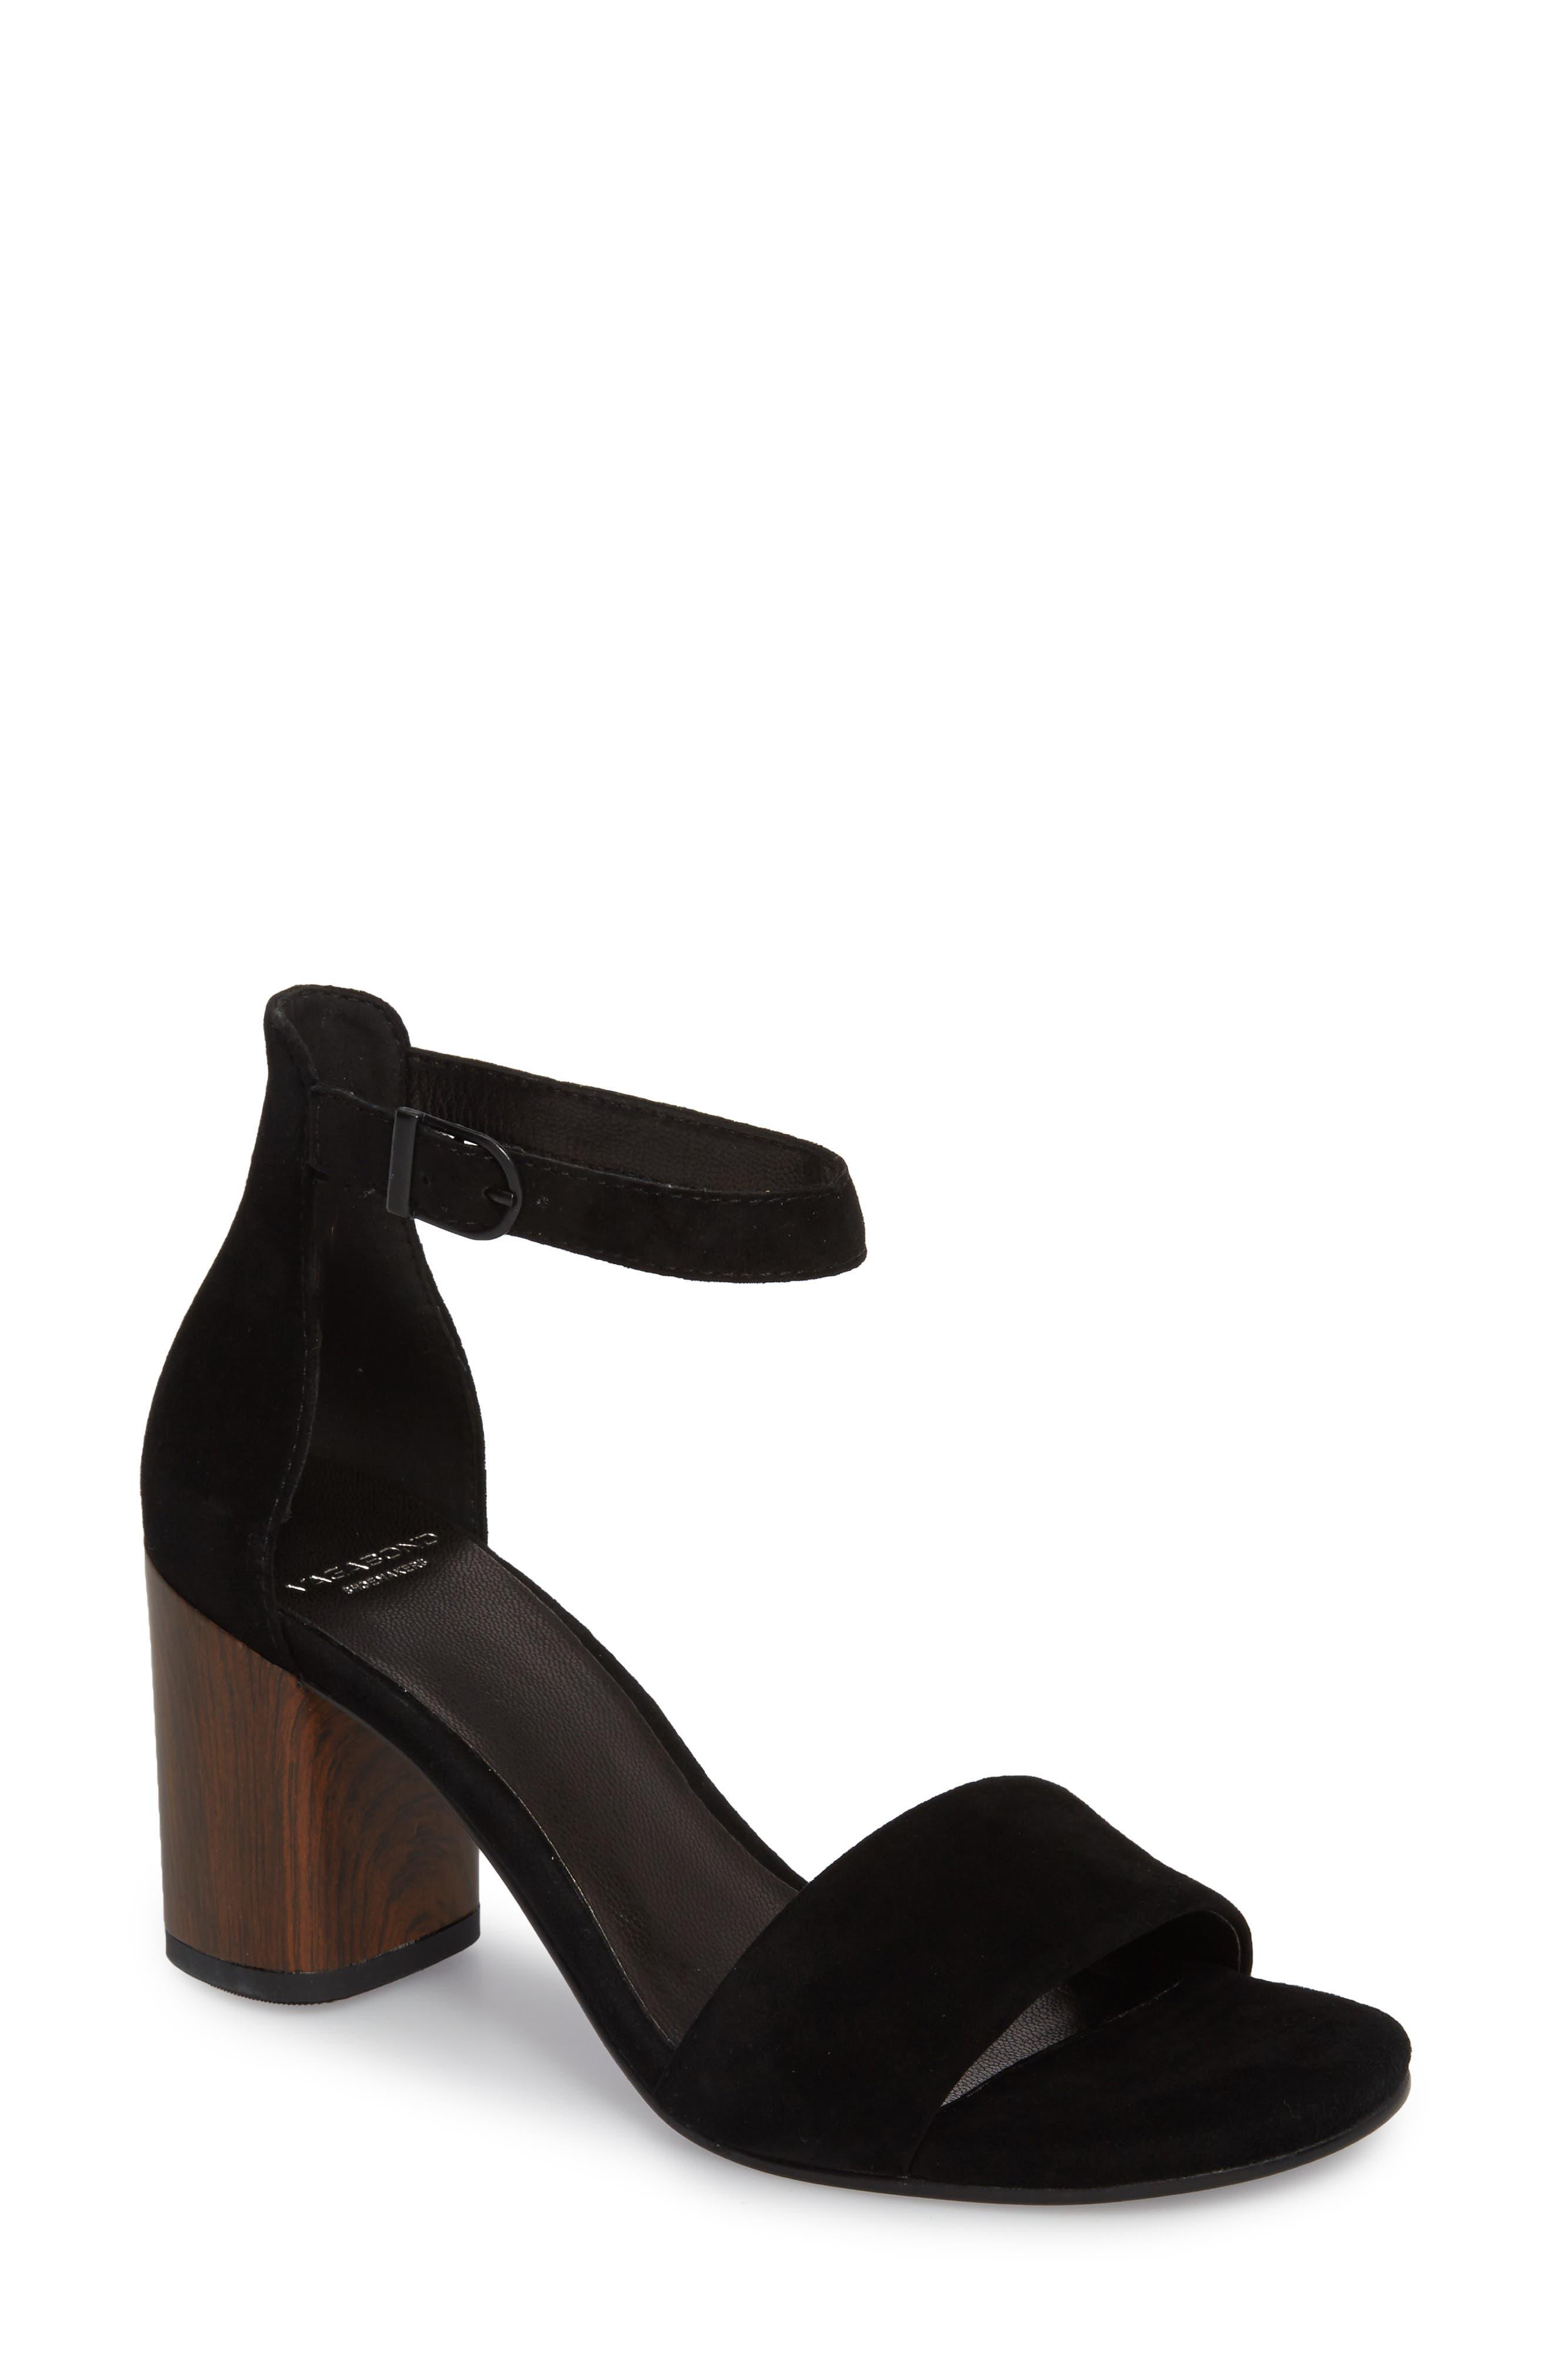 Carol Ankle Strap Sandal,                             Main thumbnail 1, color,                             BLACK SUEDE